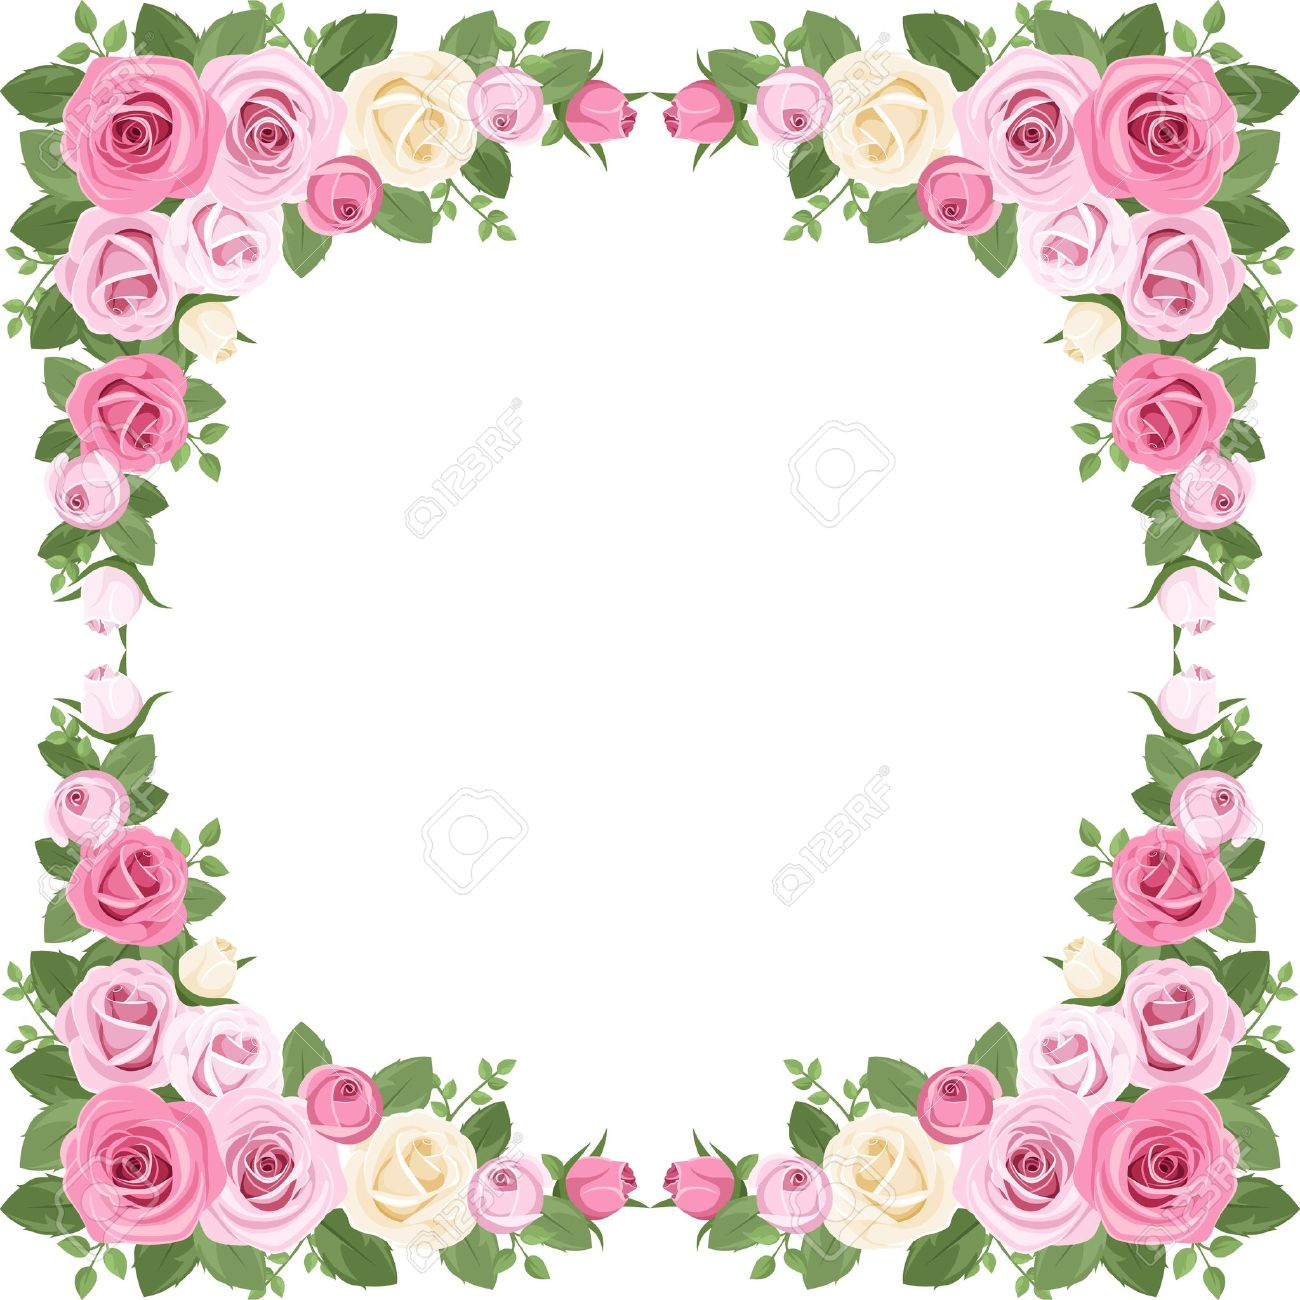 Vintage Roses Frame. Illustration. Royalty Free Cliparts, Vectors ...